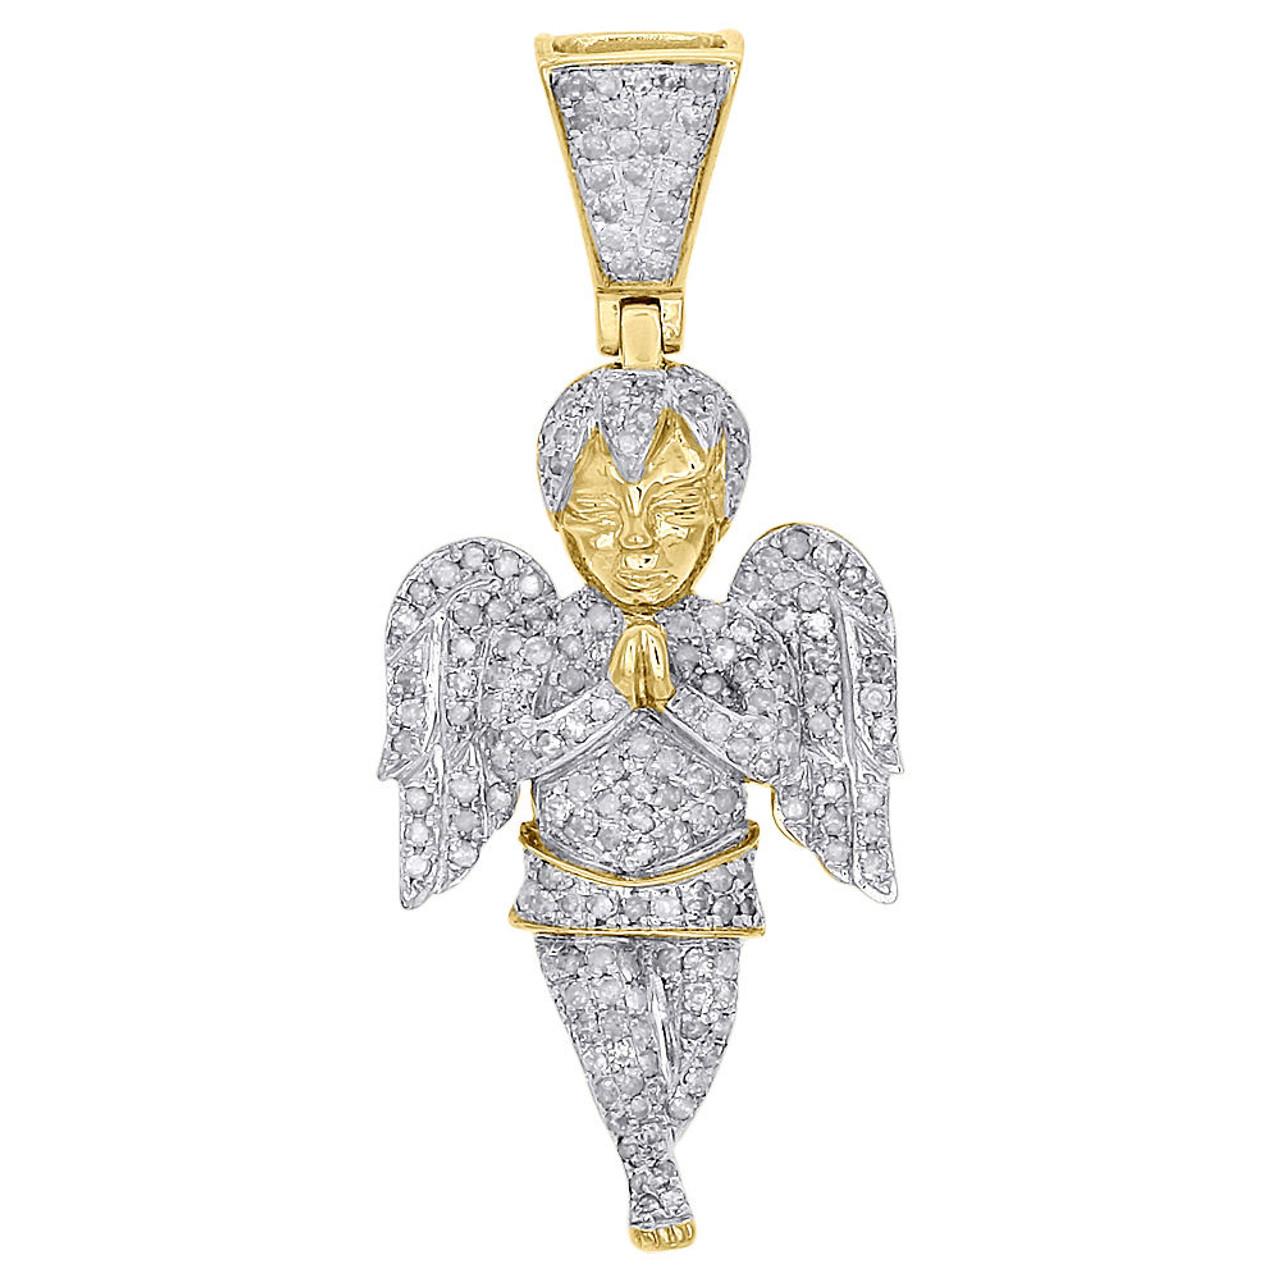 Praying Angel Charm Pendant Diamond Cut Real 10K Yellow White Two-Tone Gold